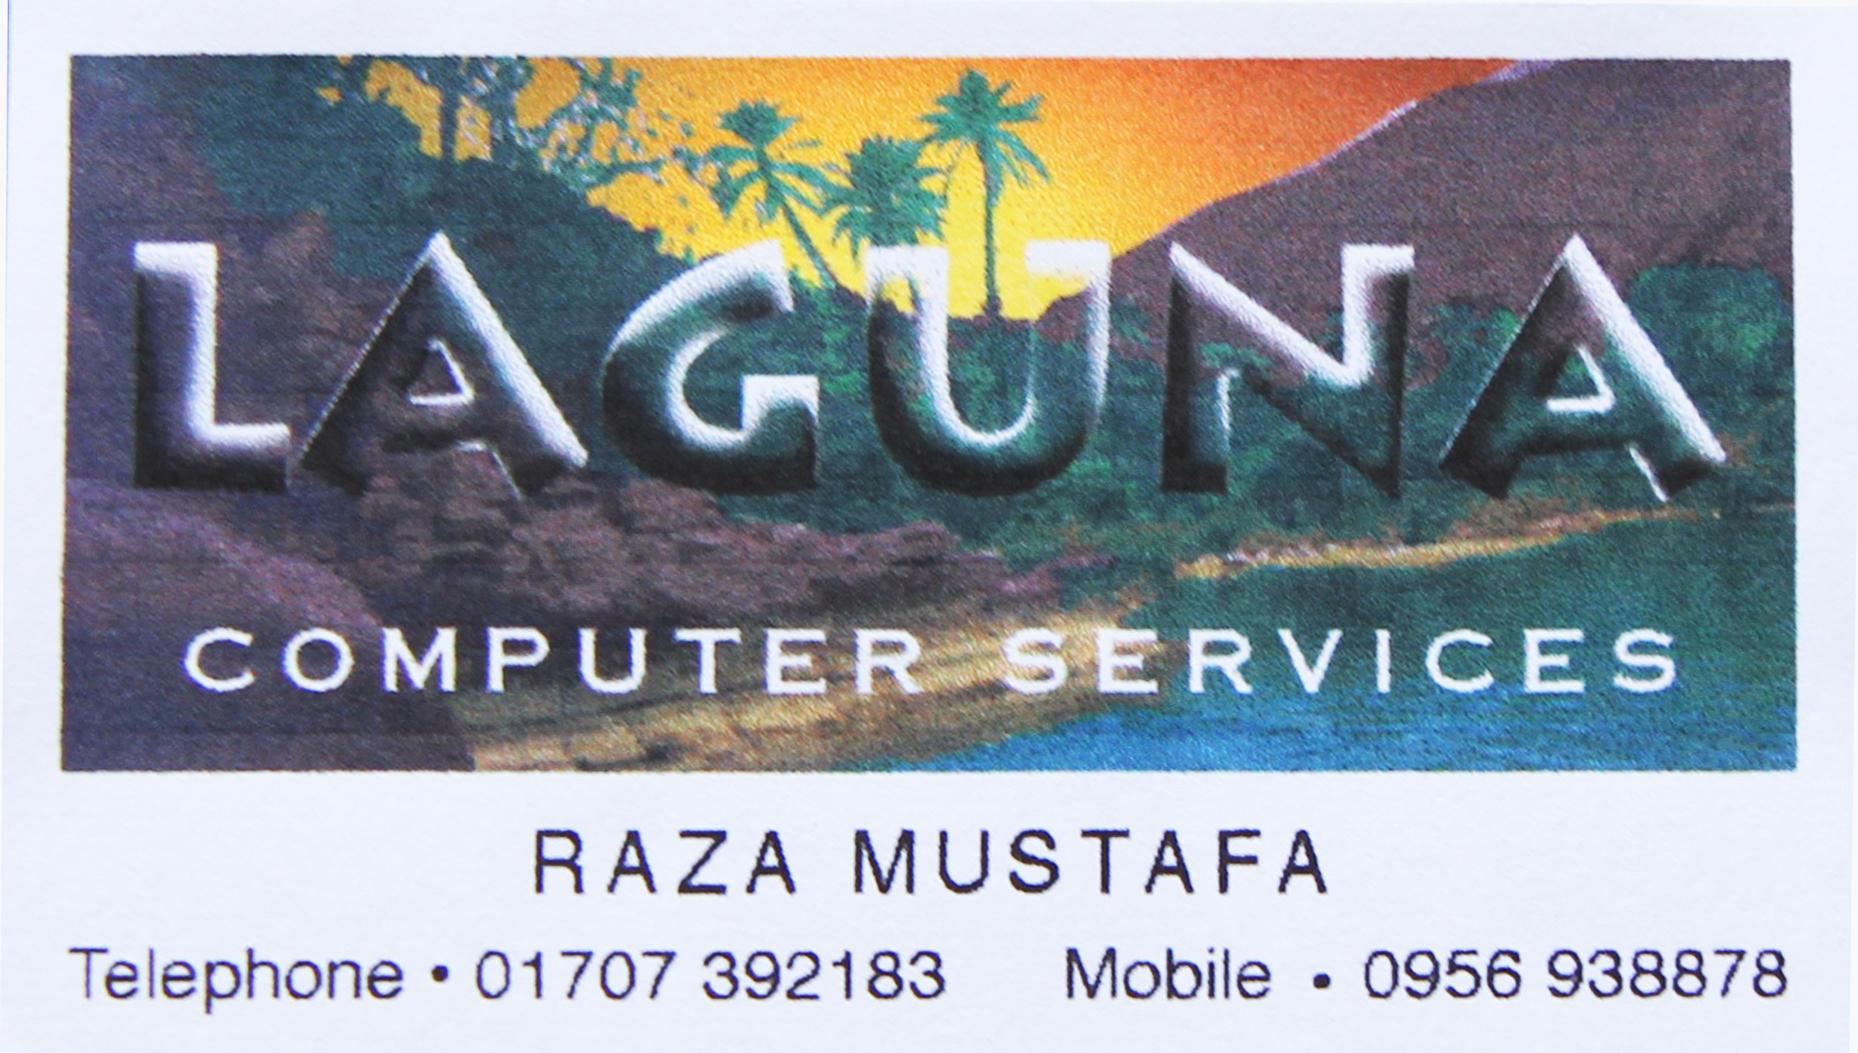 Laguna Computer Services biz card